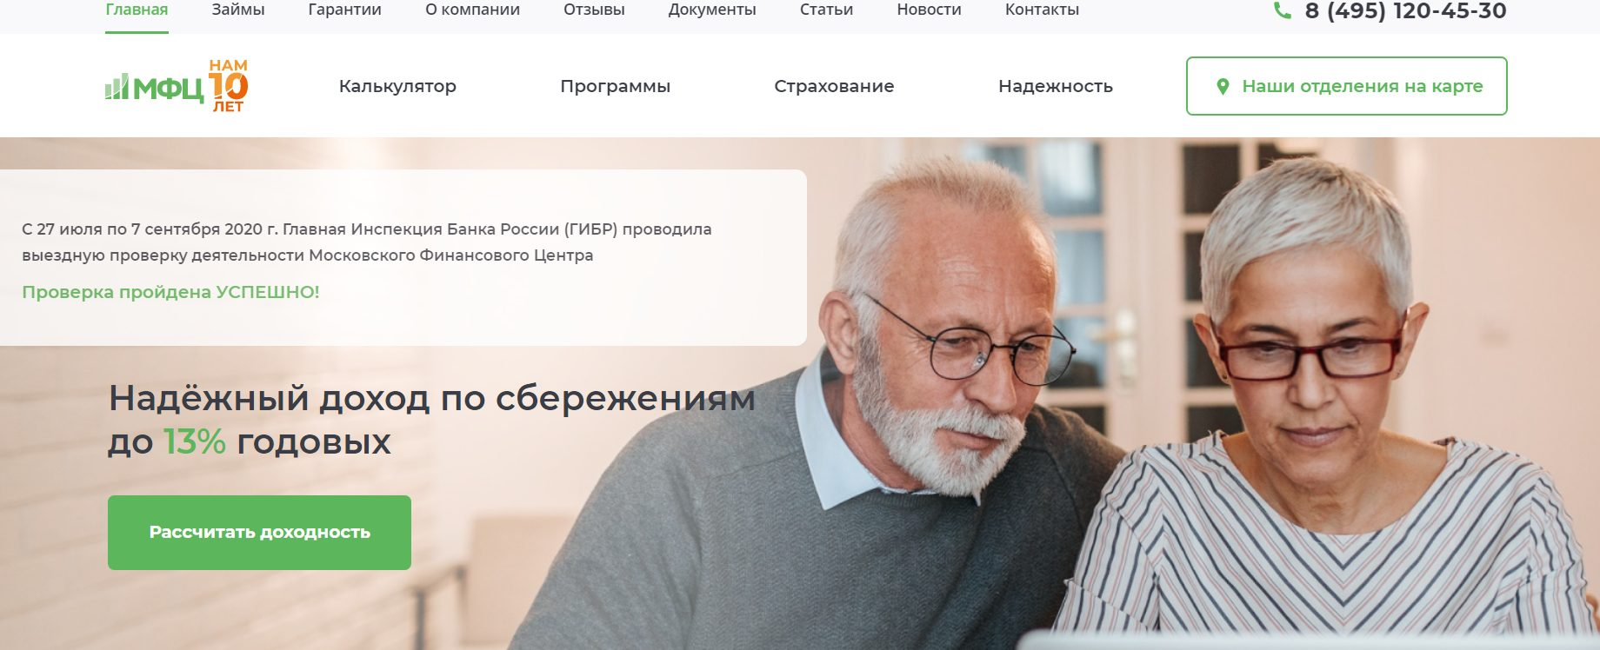 Сайт проекта Mosfincentr.ru